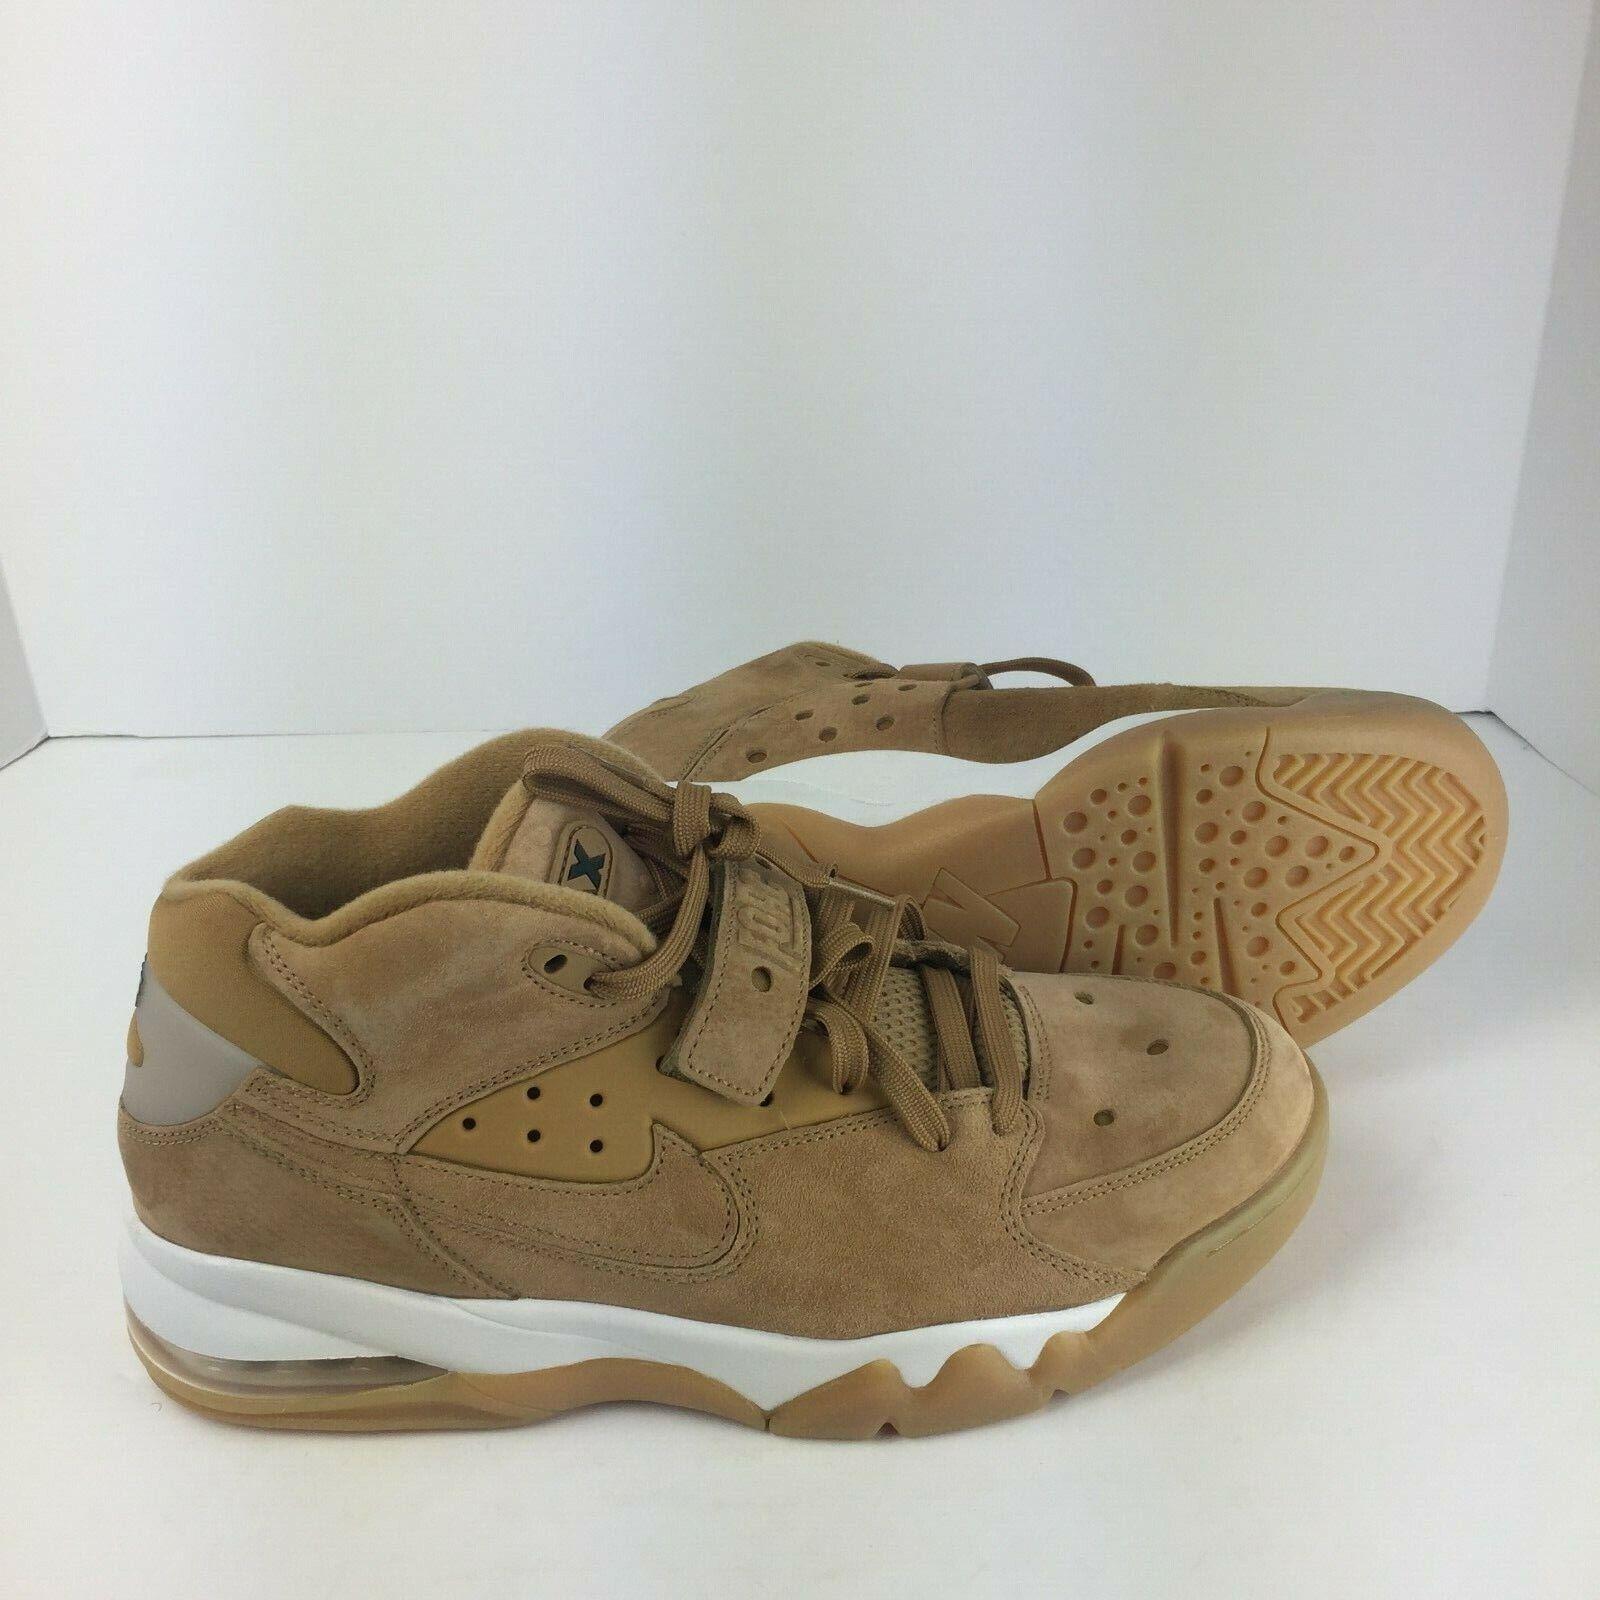 Nike Air Force Max Premium Mens Wheat White 315065-200 Basketball Sneaker